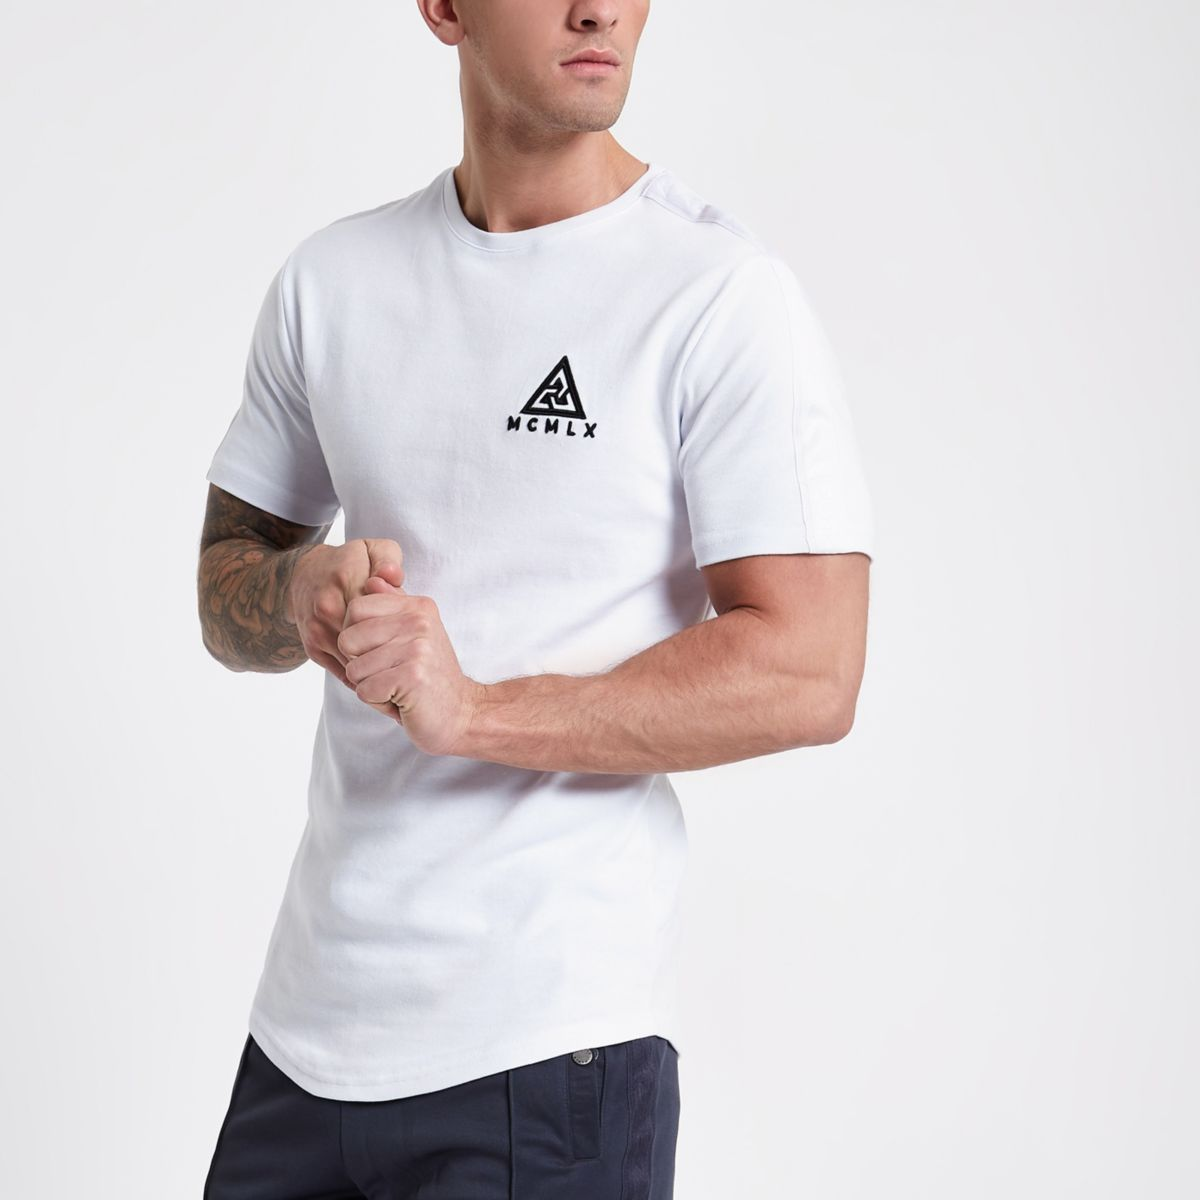 White Concept 'MCMLX' slim fit T-shirt